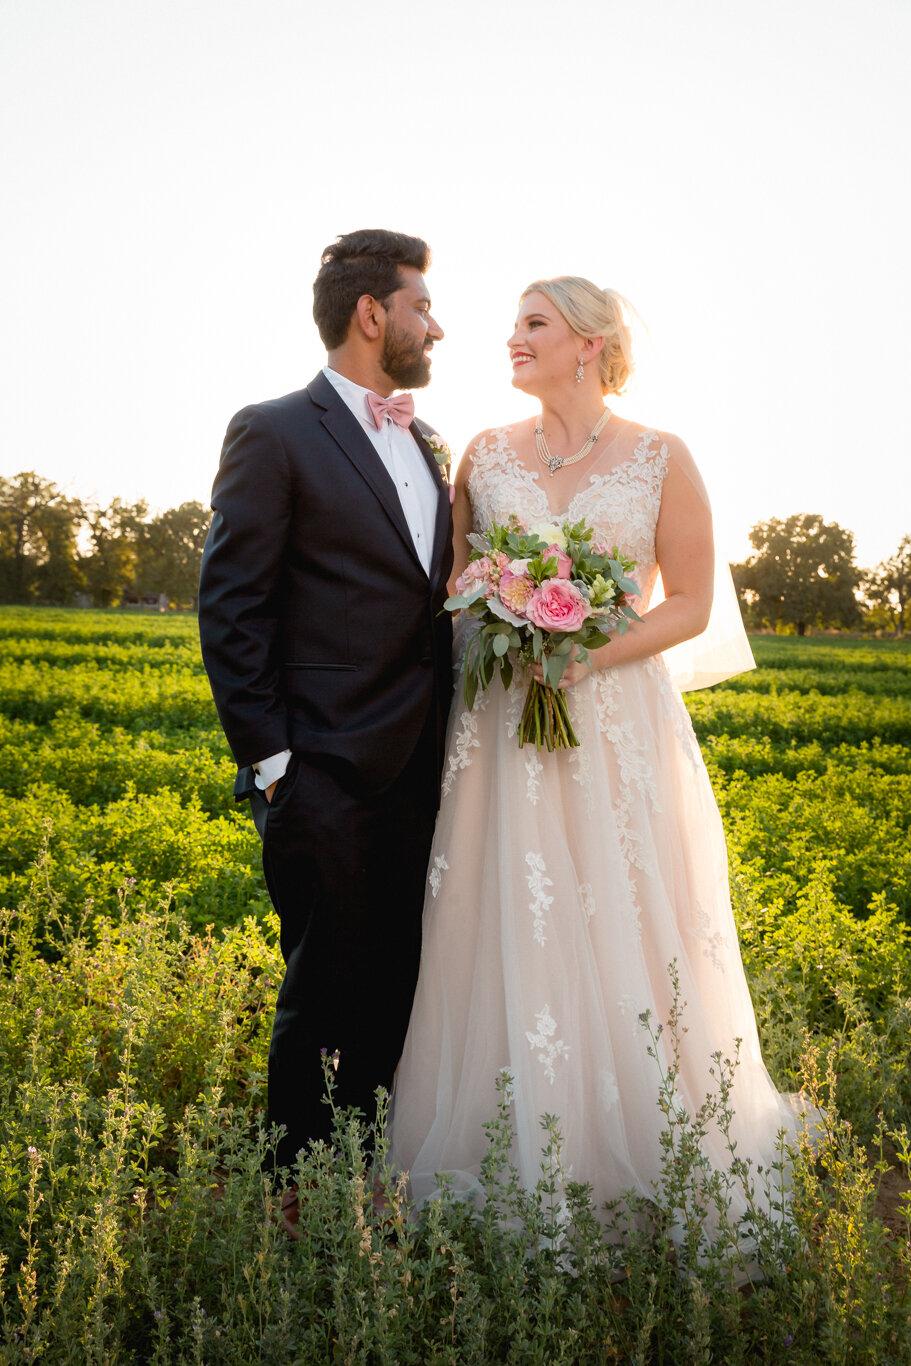 2019.08.24_Emily-Ashir-Wedding-at-the-Maples-6212.jpg